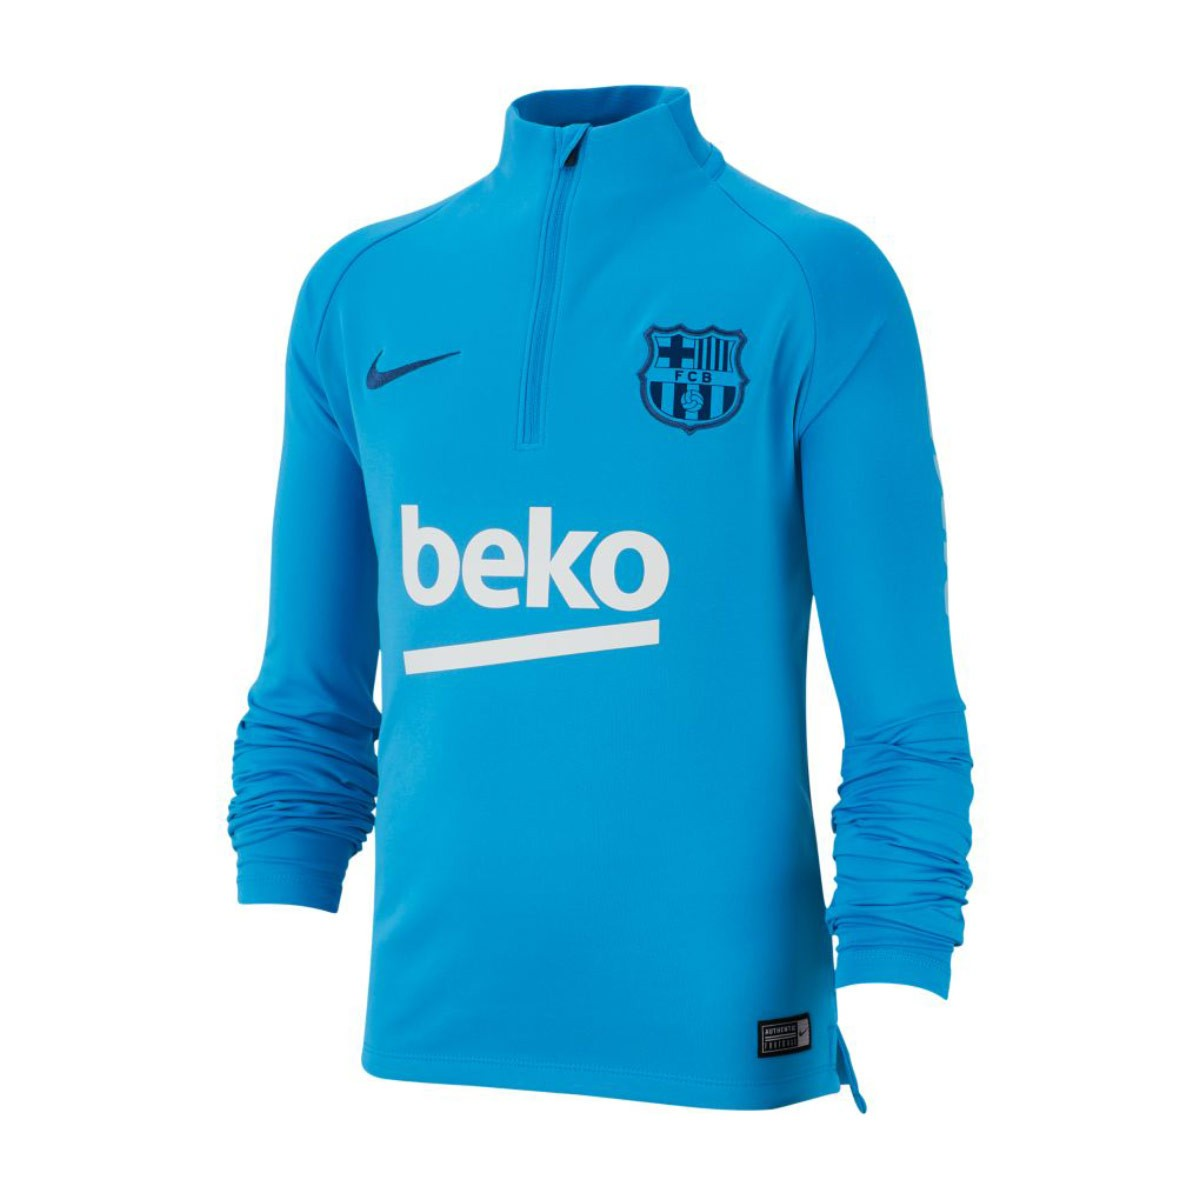 408f40fe40d9a Sudadera Nike Dry FC Barcelona Squad 2018-2019 Niño Equator blue-Coastal  blue - Tienda de fútbol Fútbol Emotion